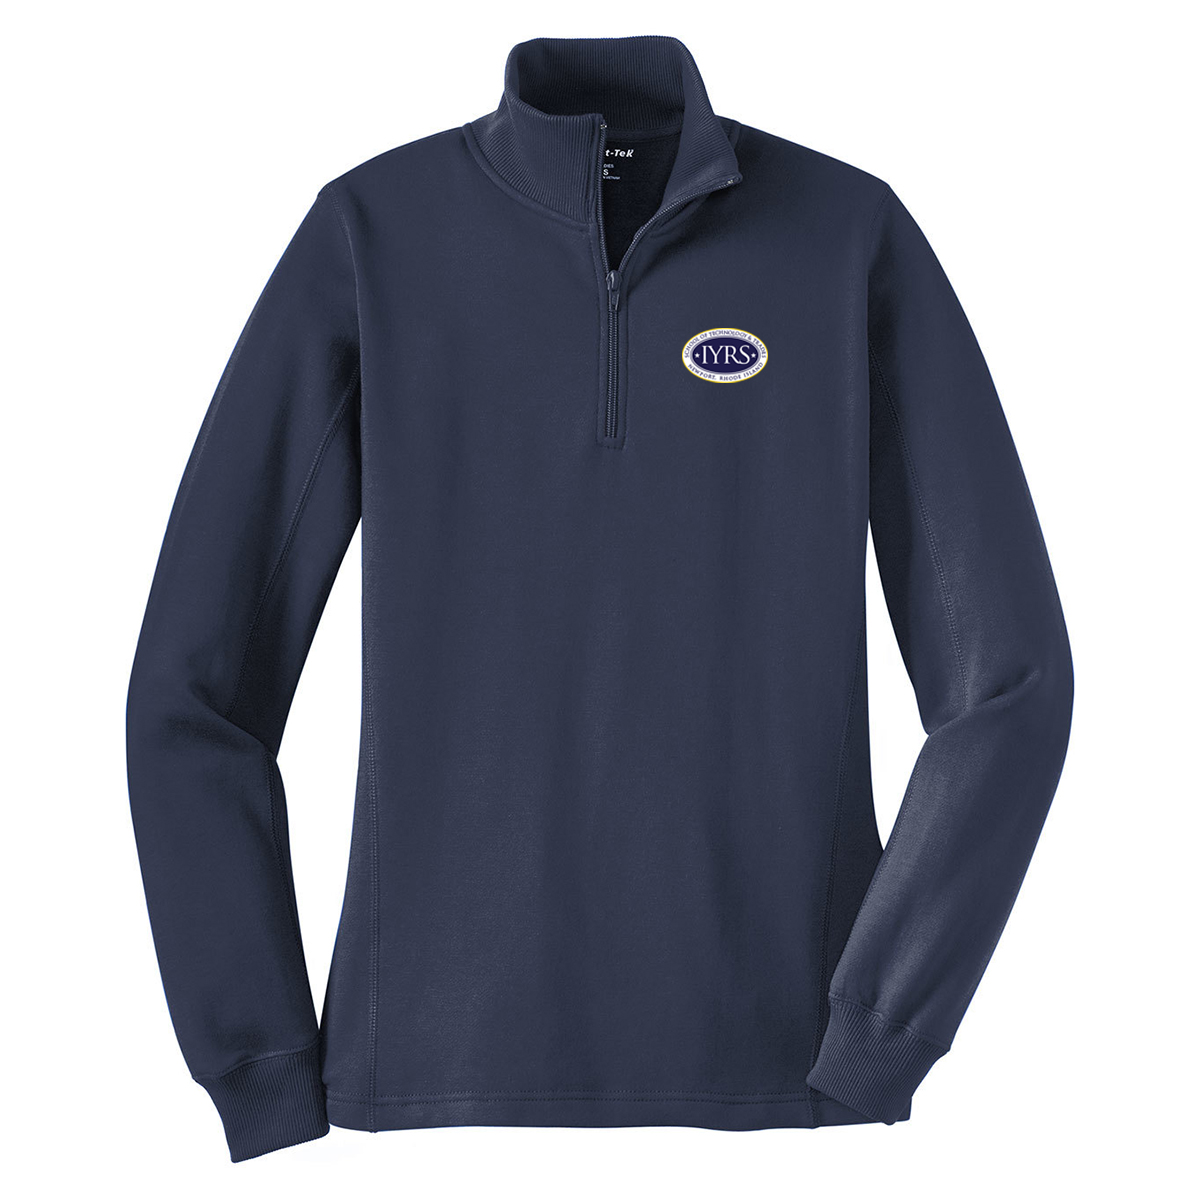 International Yacht Restoration School - Women's 1/4 Zip Sweatshirt